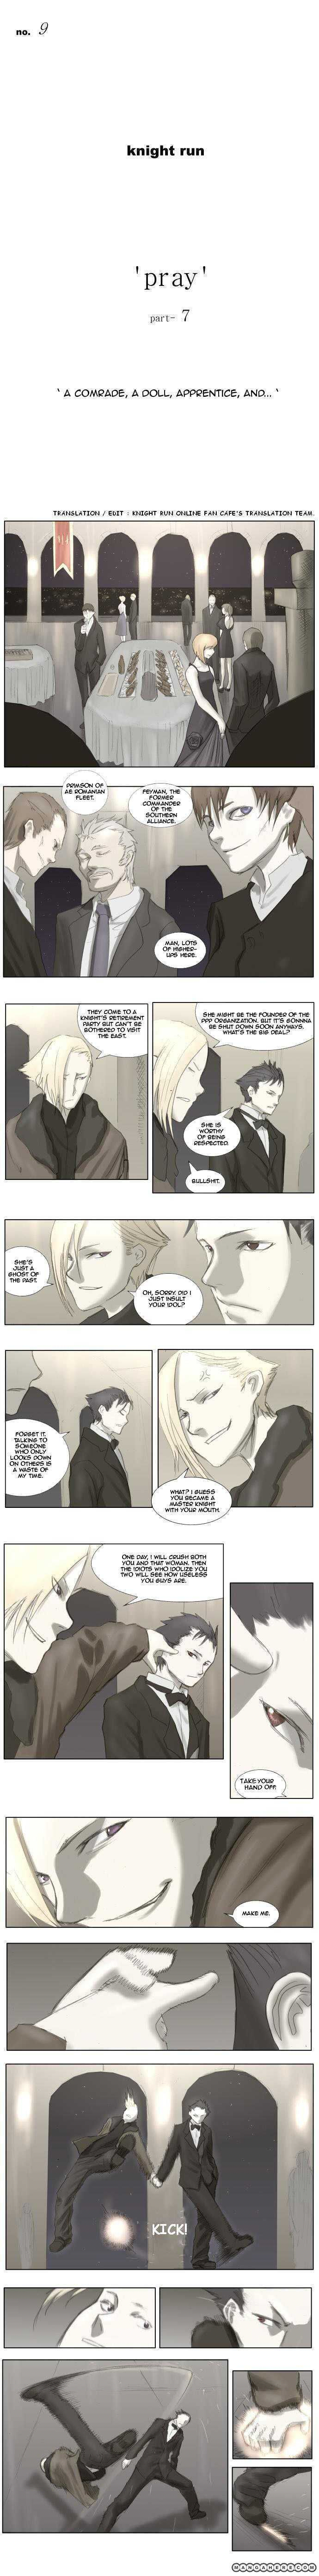 Knight Run 9 Page 1